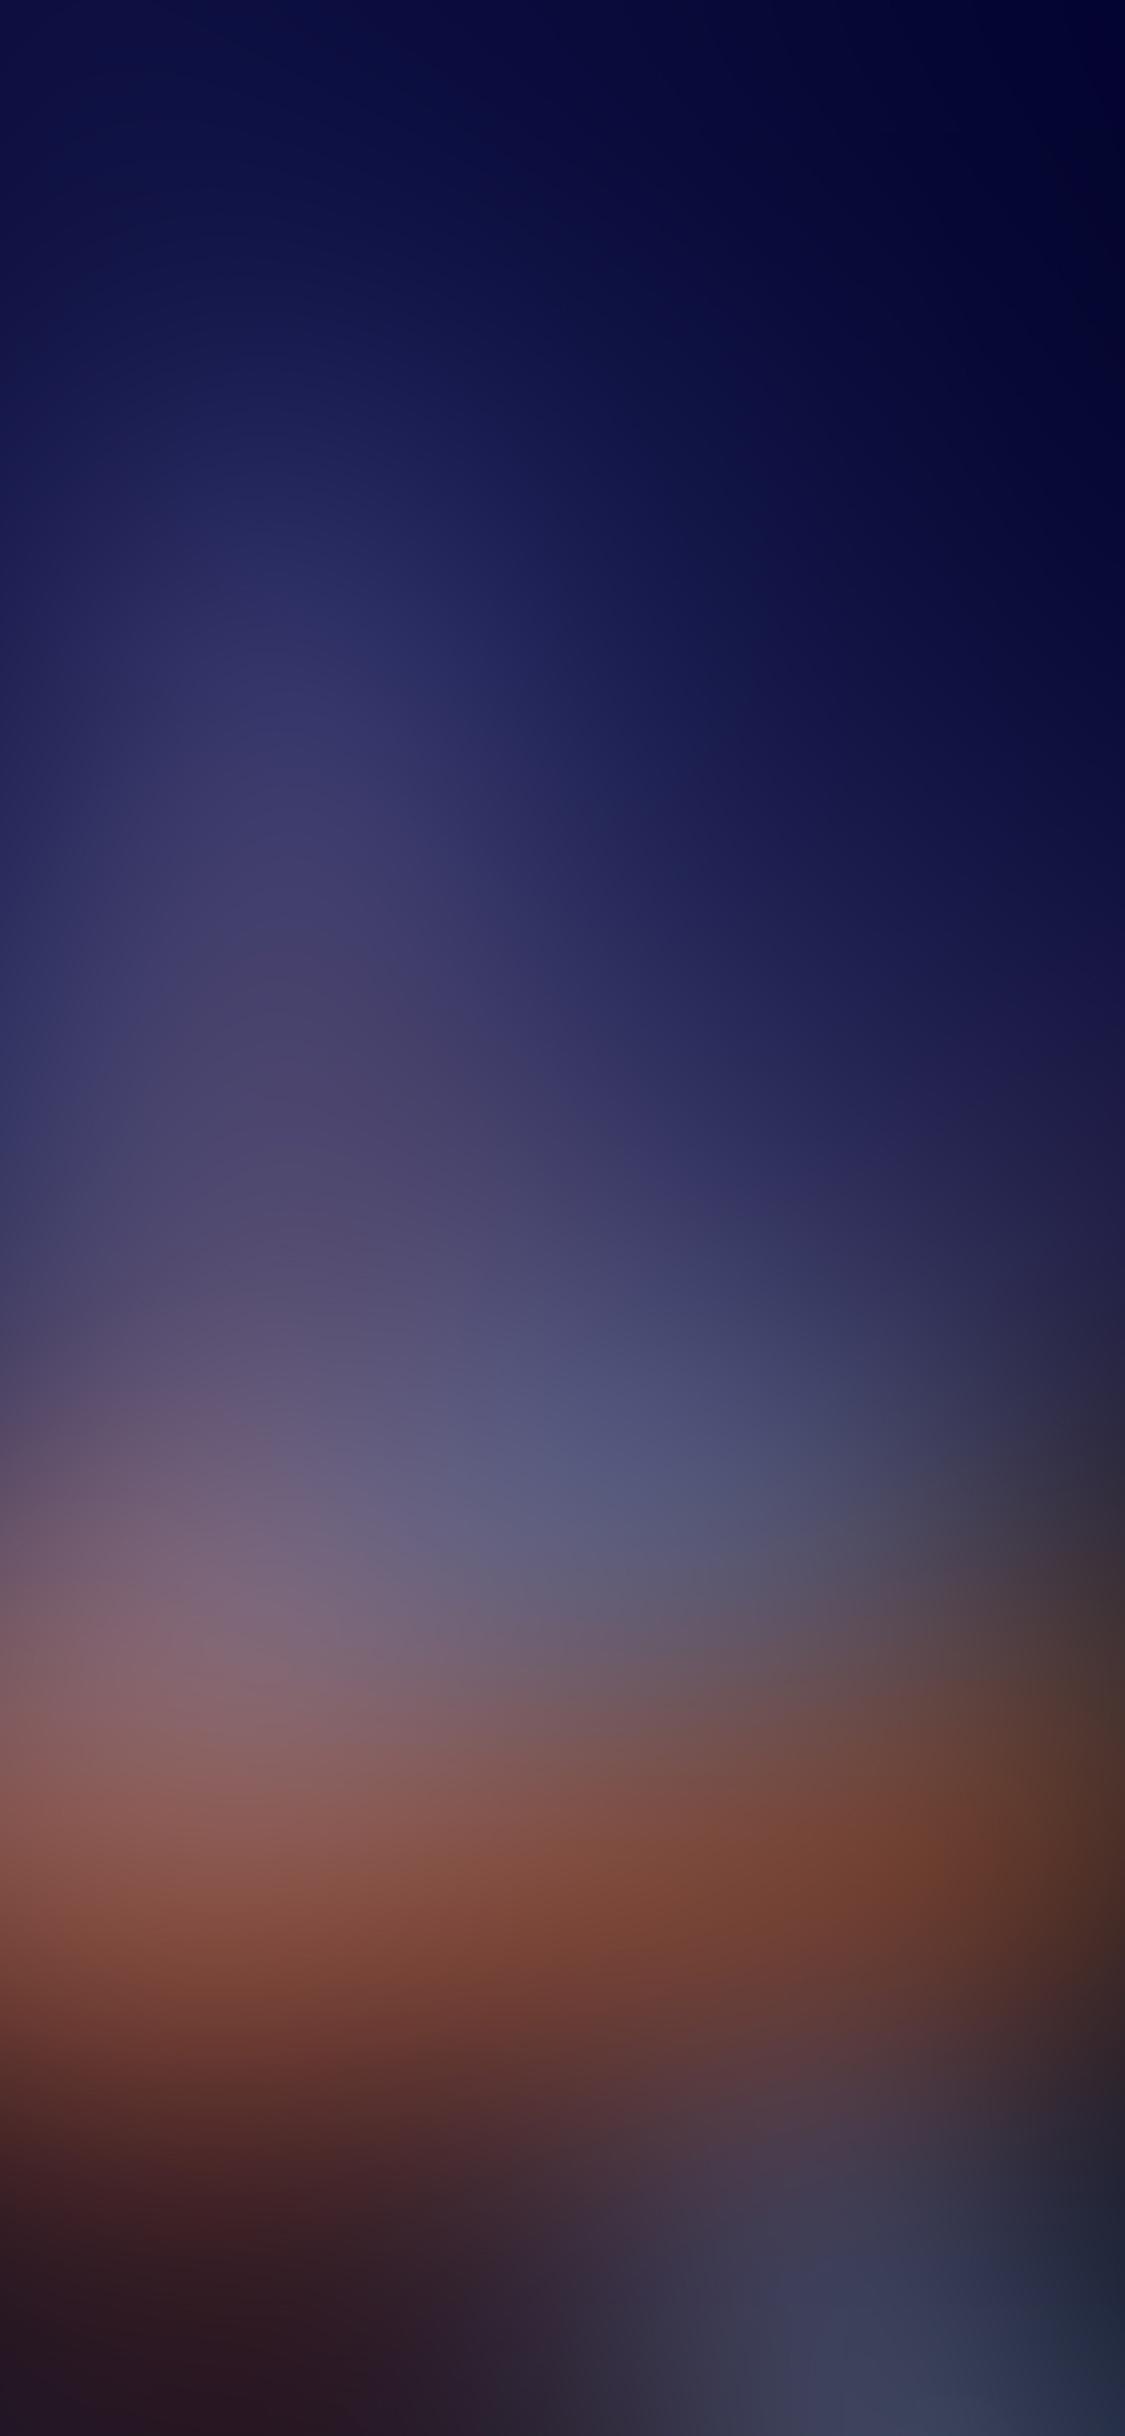 iPhoneXpapers.com-Apple-iPhone-wallpaper-sk65-night-sea-blur-gradation